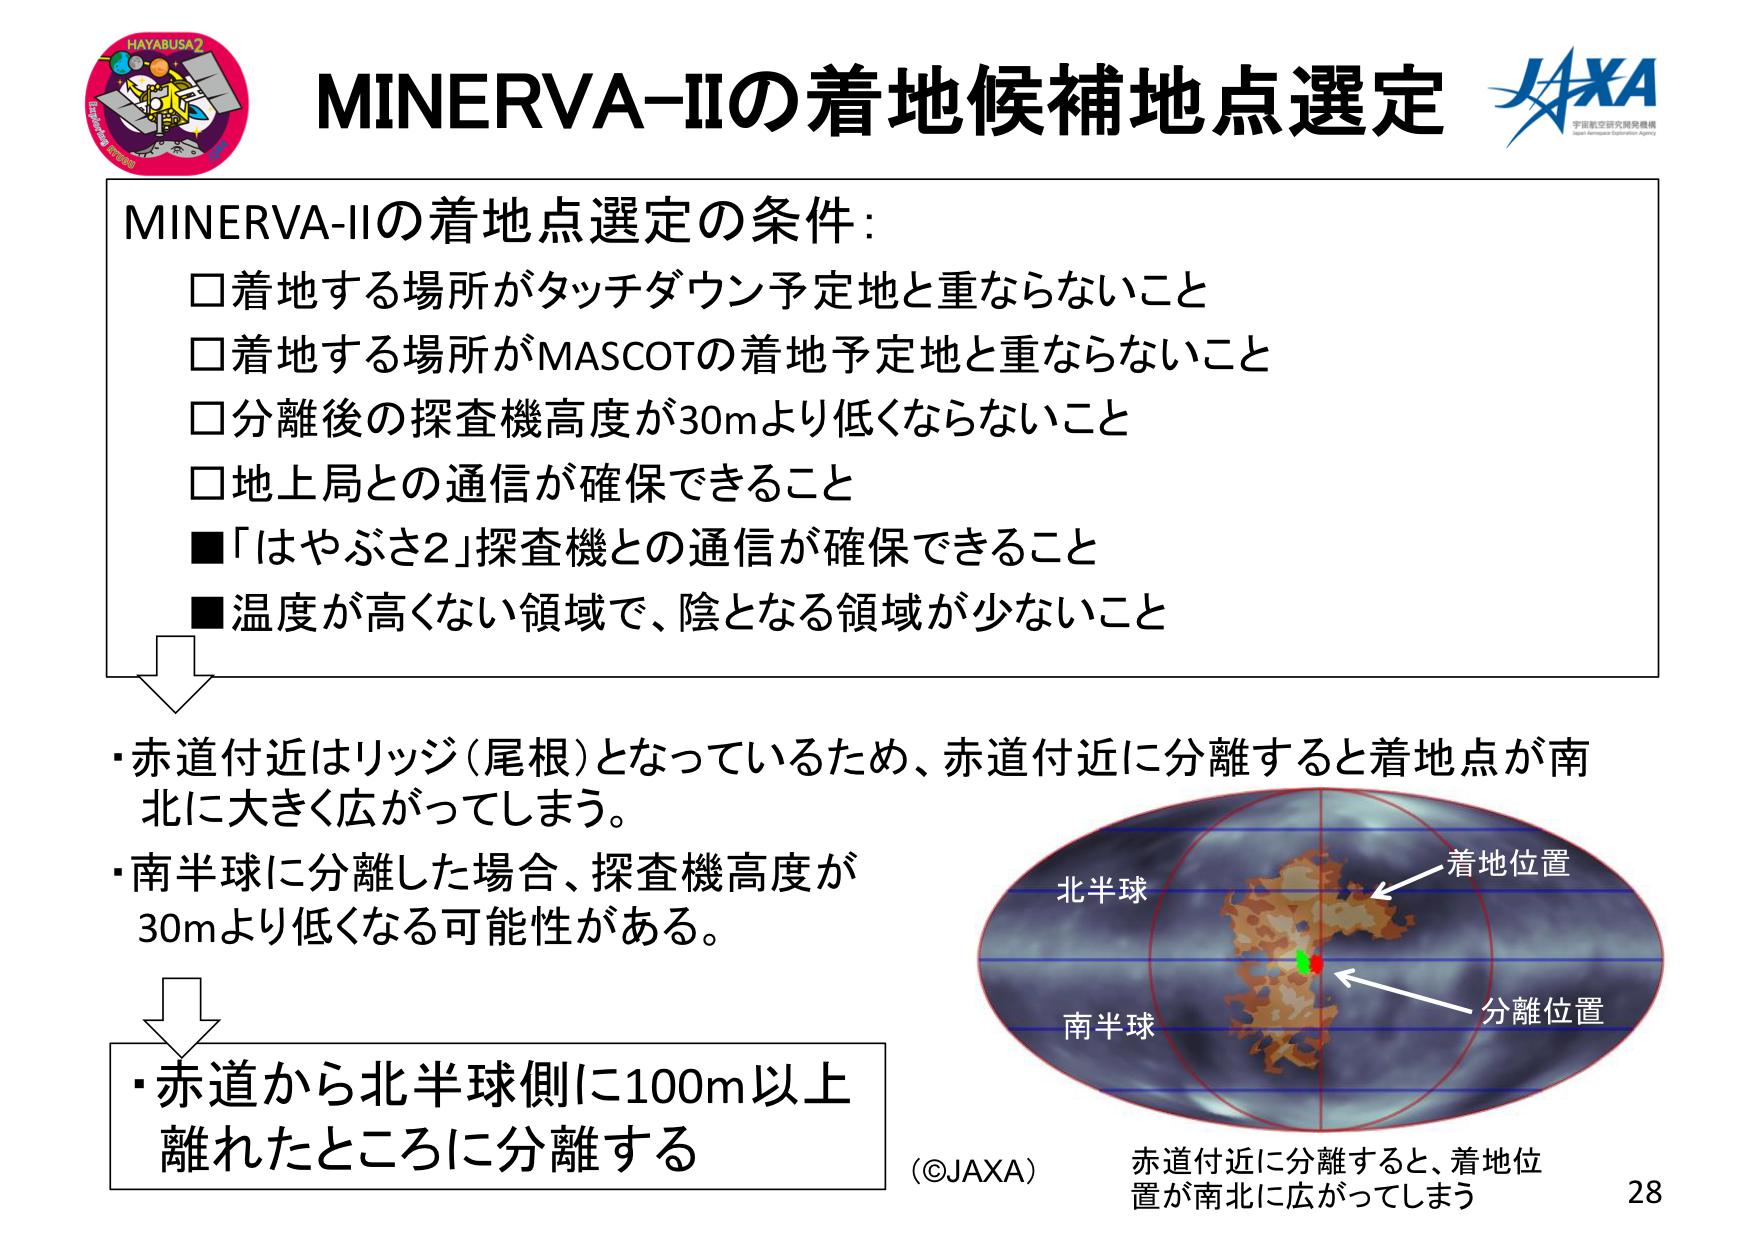 f:id:Imamura:20180905232000p:plain